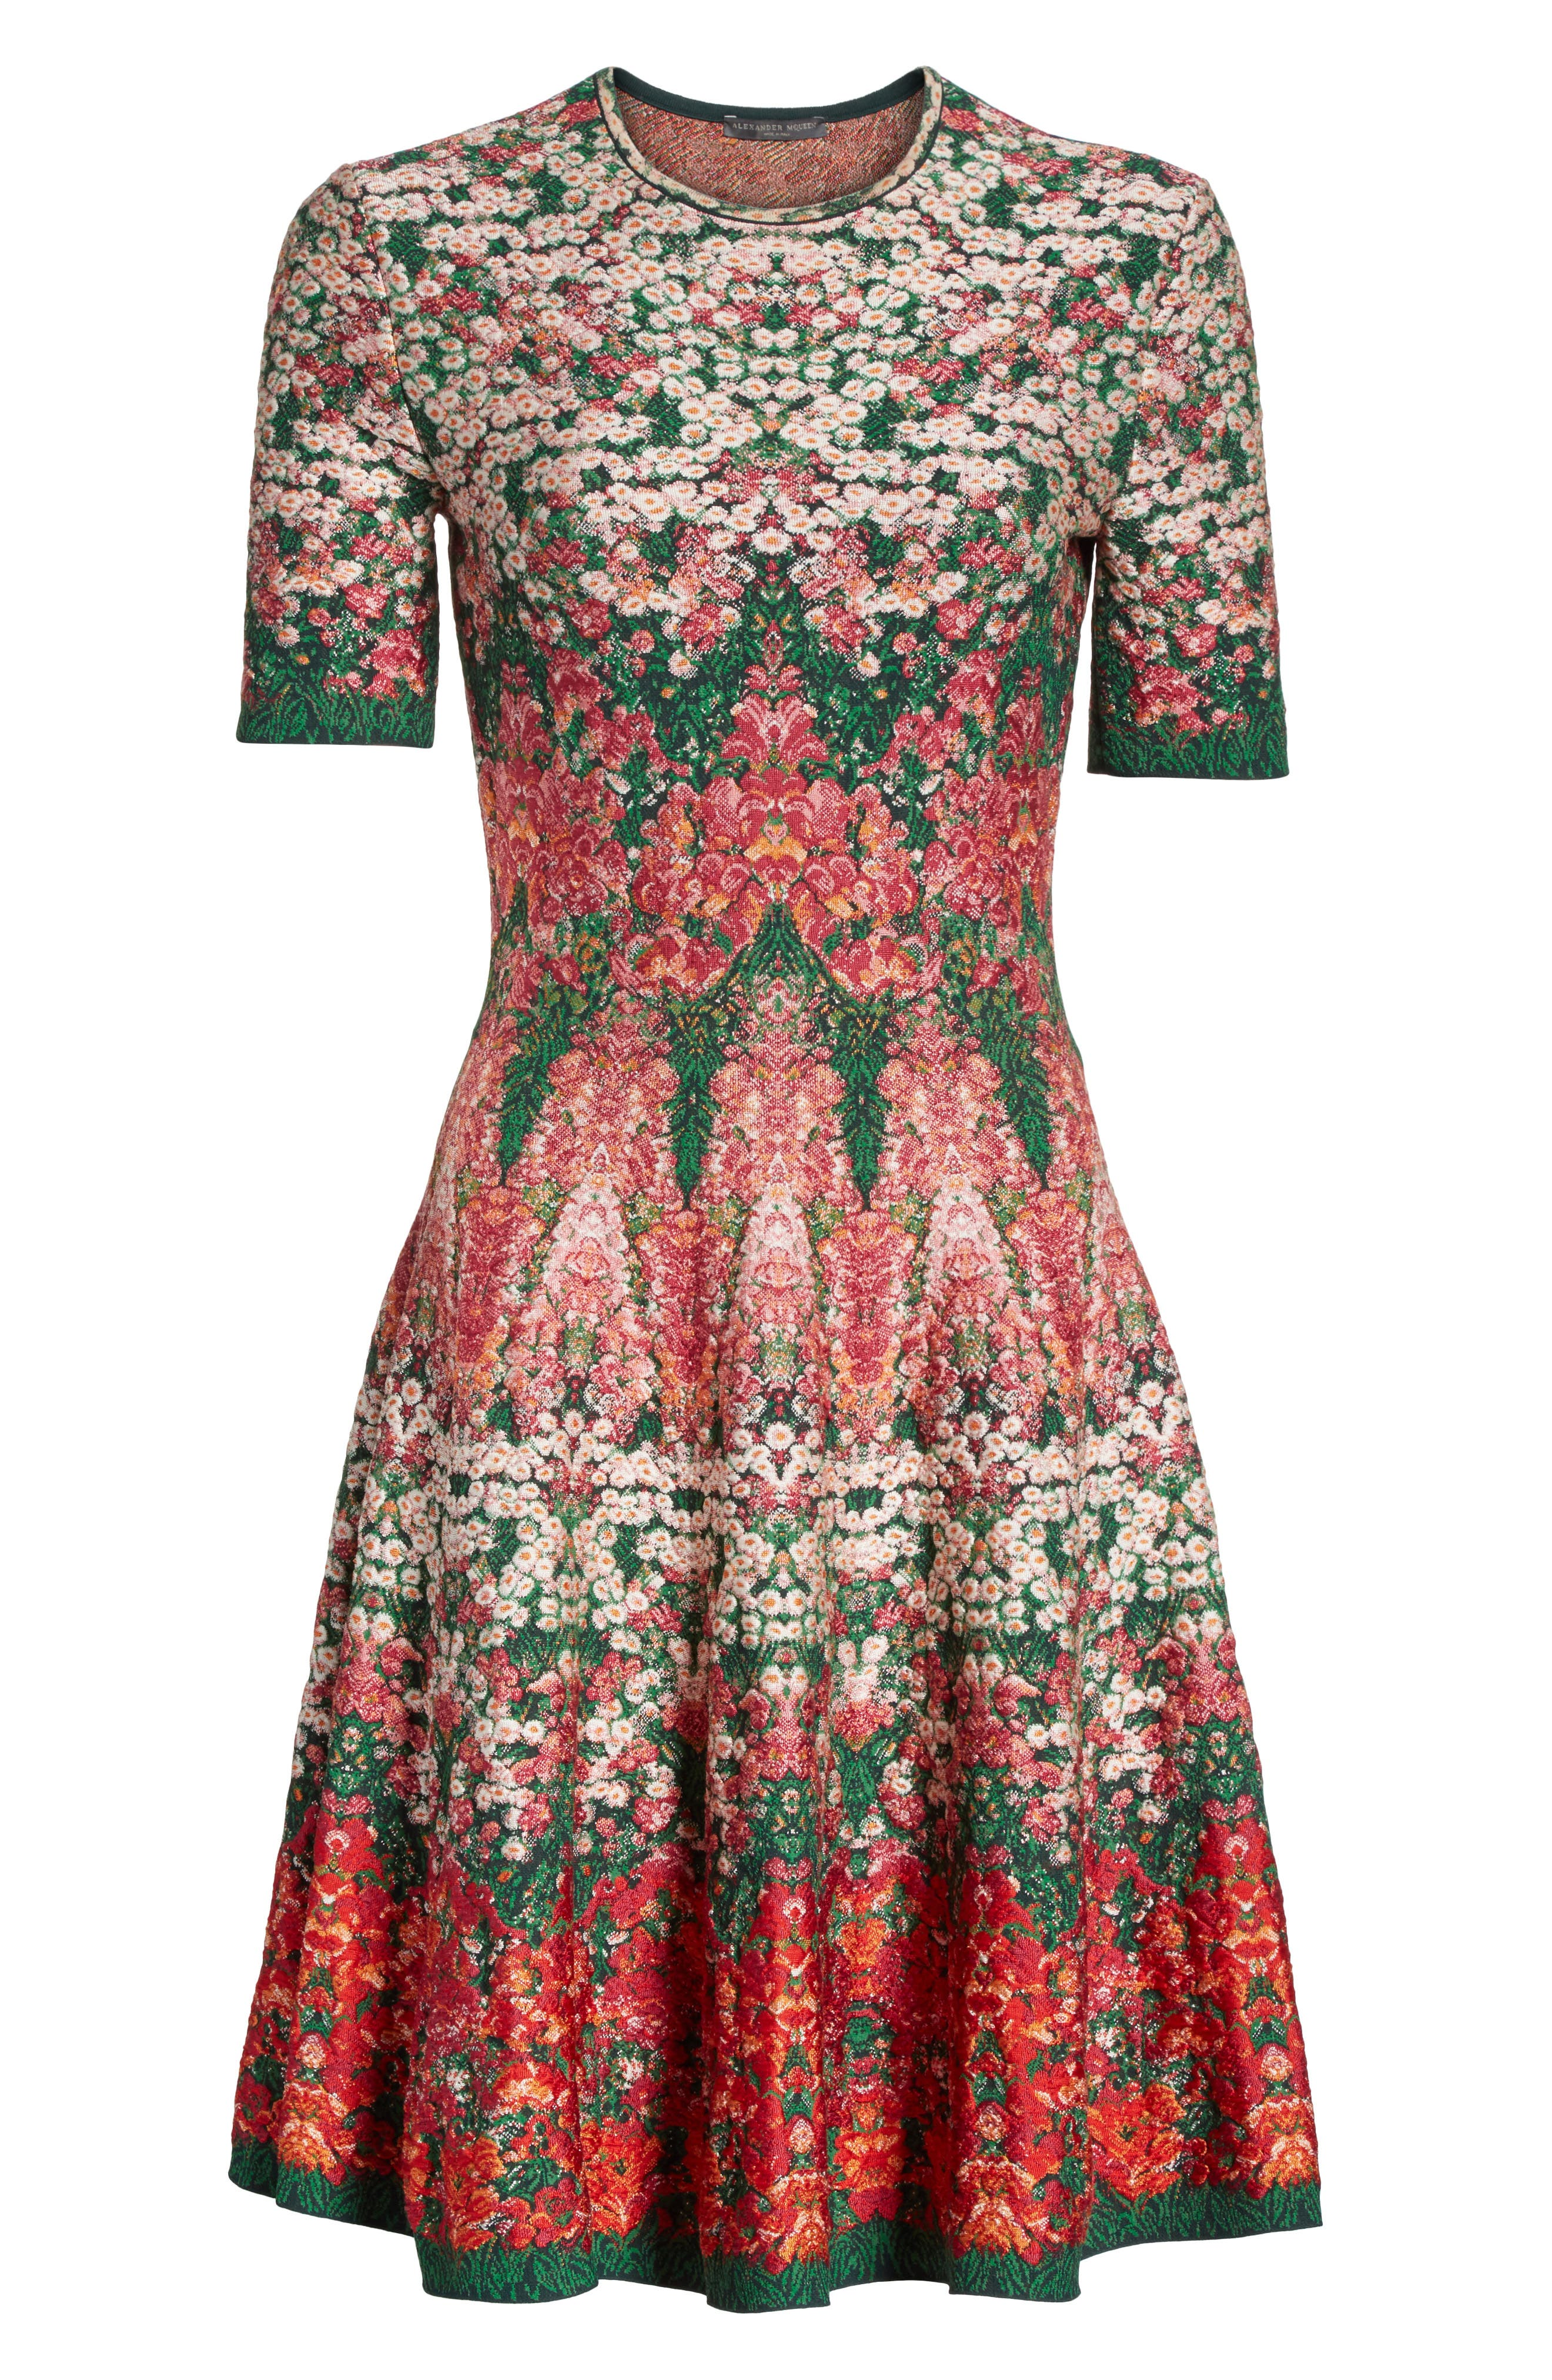 Floral Jacquard Knit Fit & Flare Dress,                             Alternate thumbnail 6, color,                             Multicolor